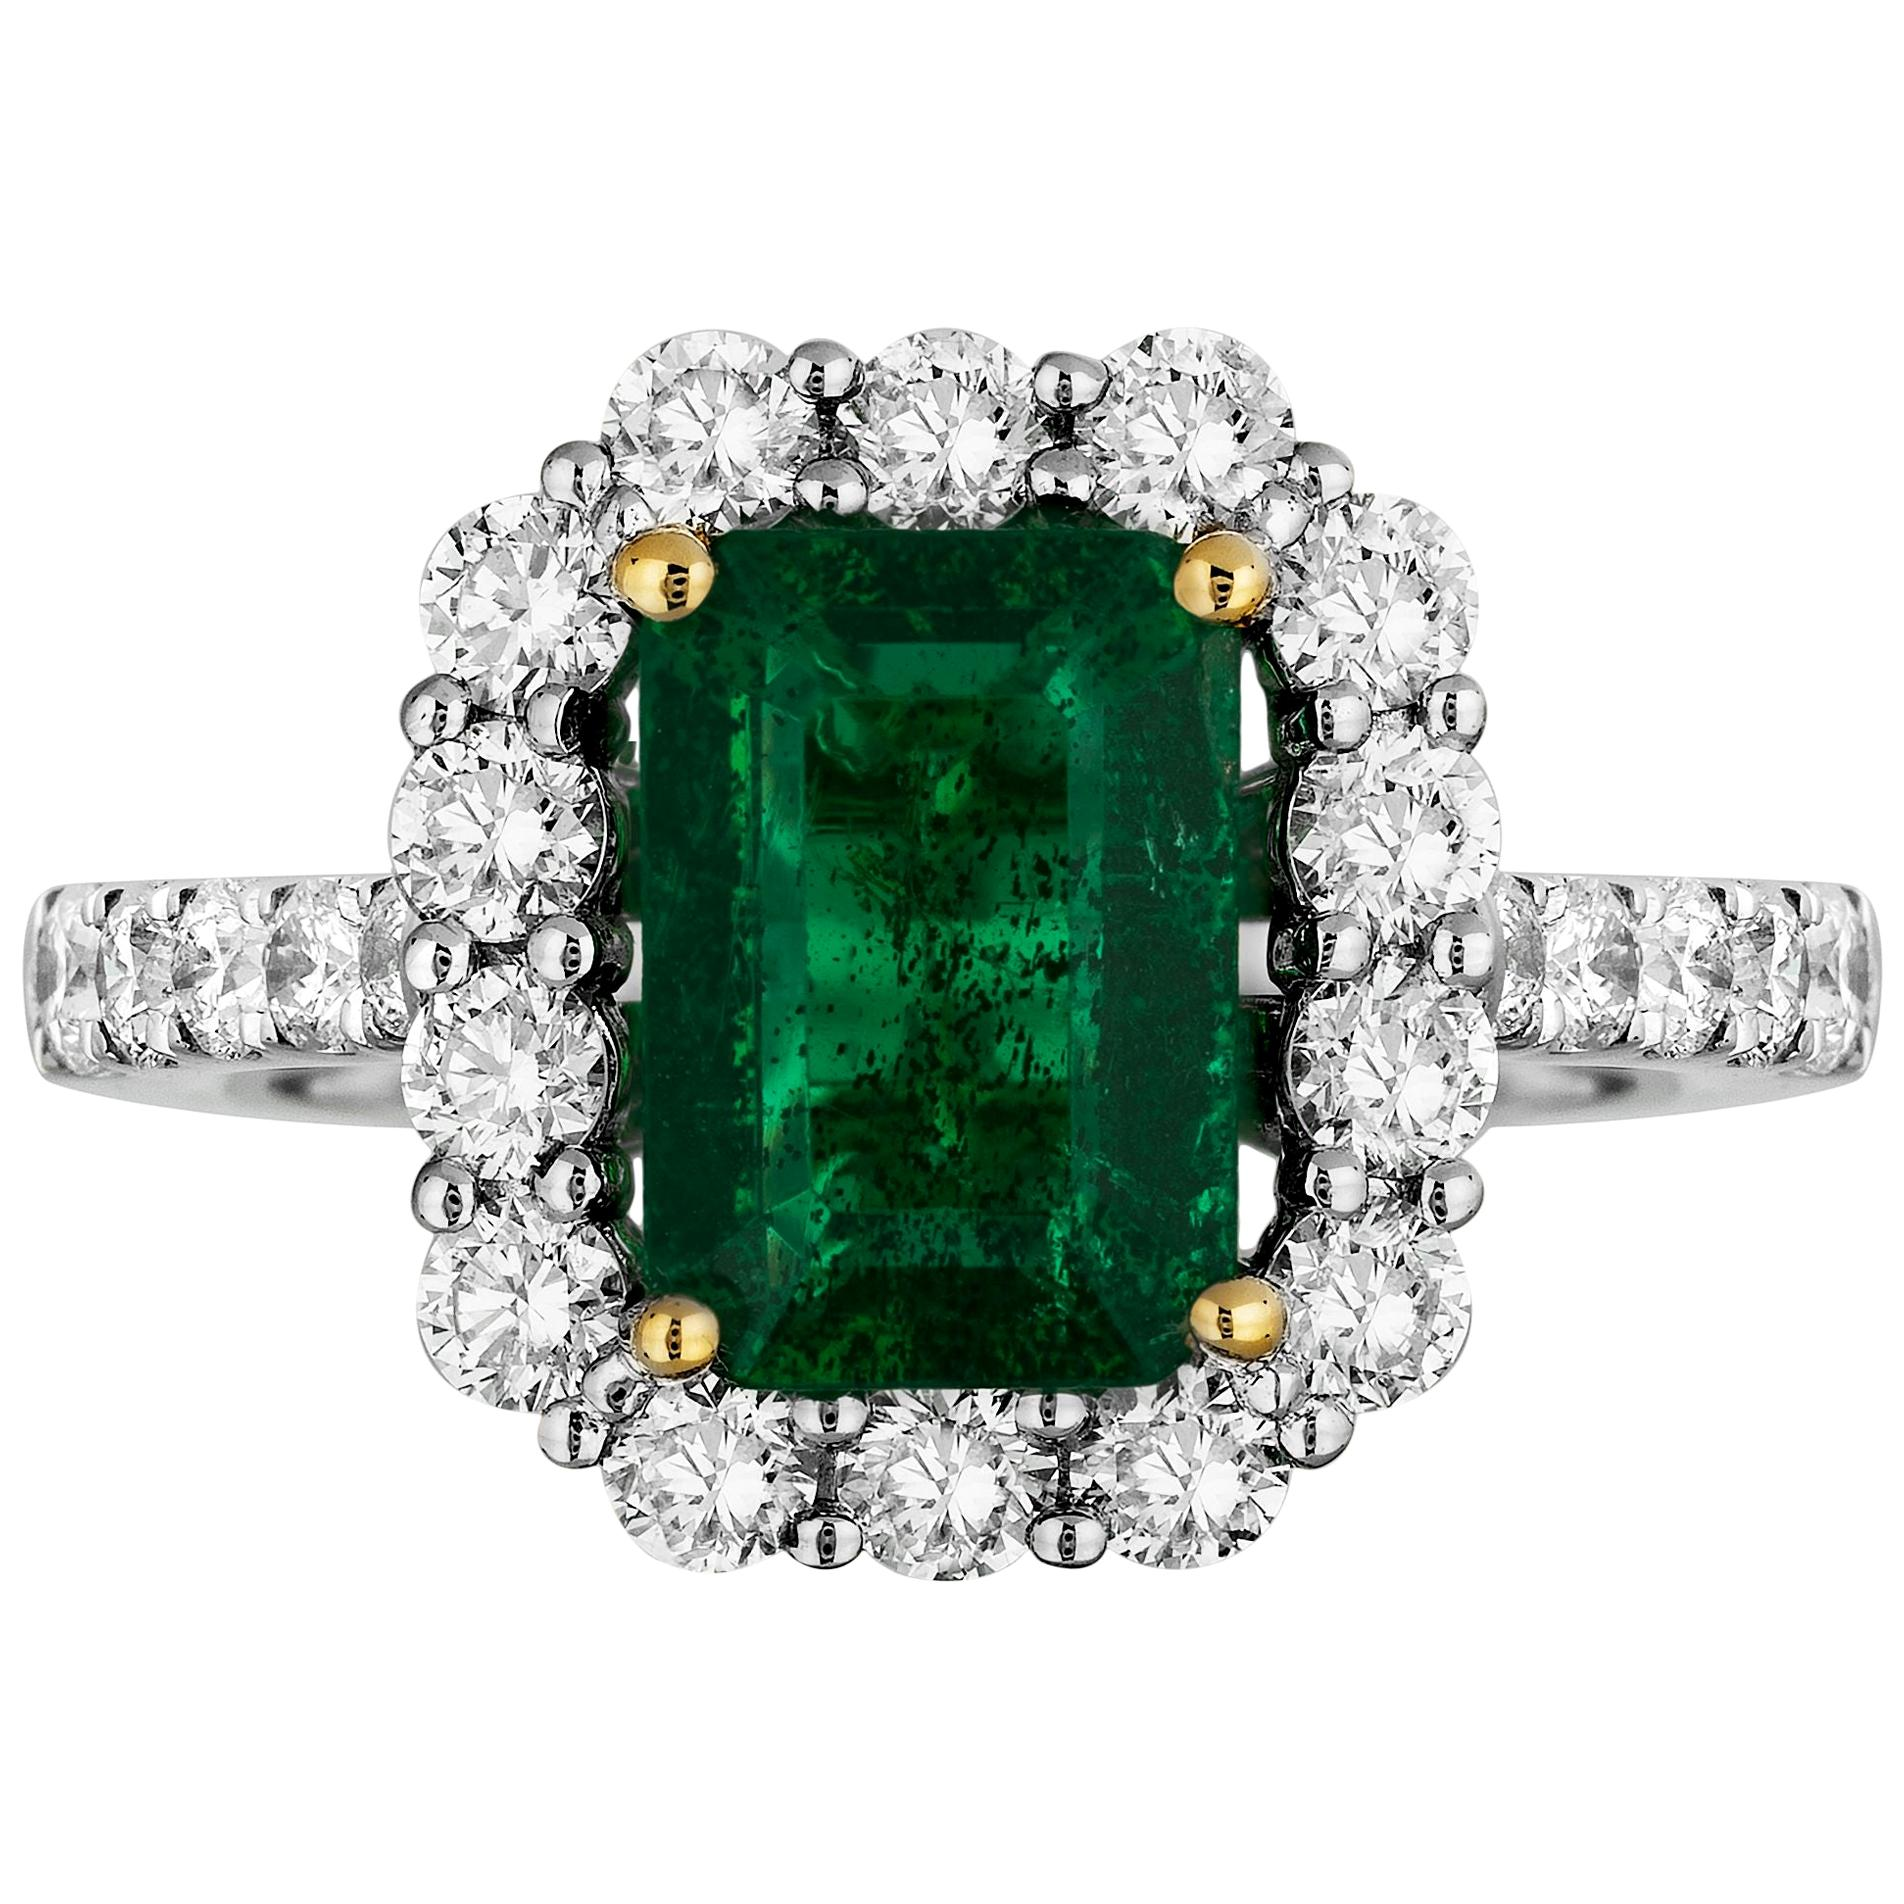 1.92 Carat Emerald Diamond Cocktail Ring